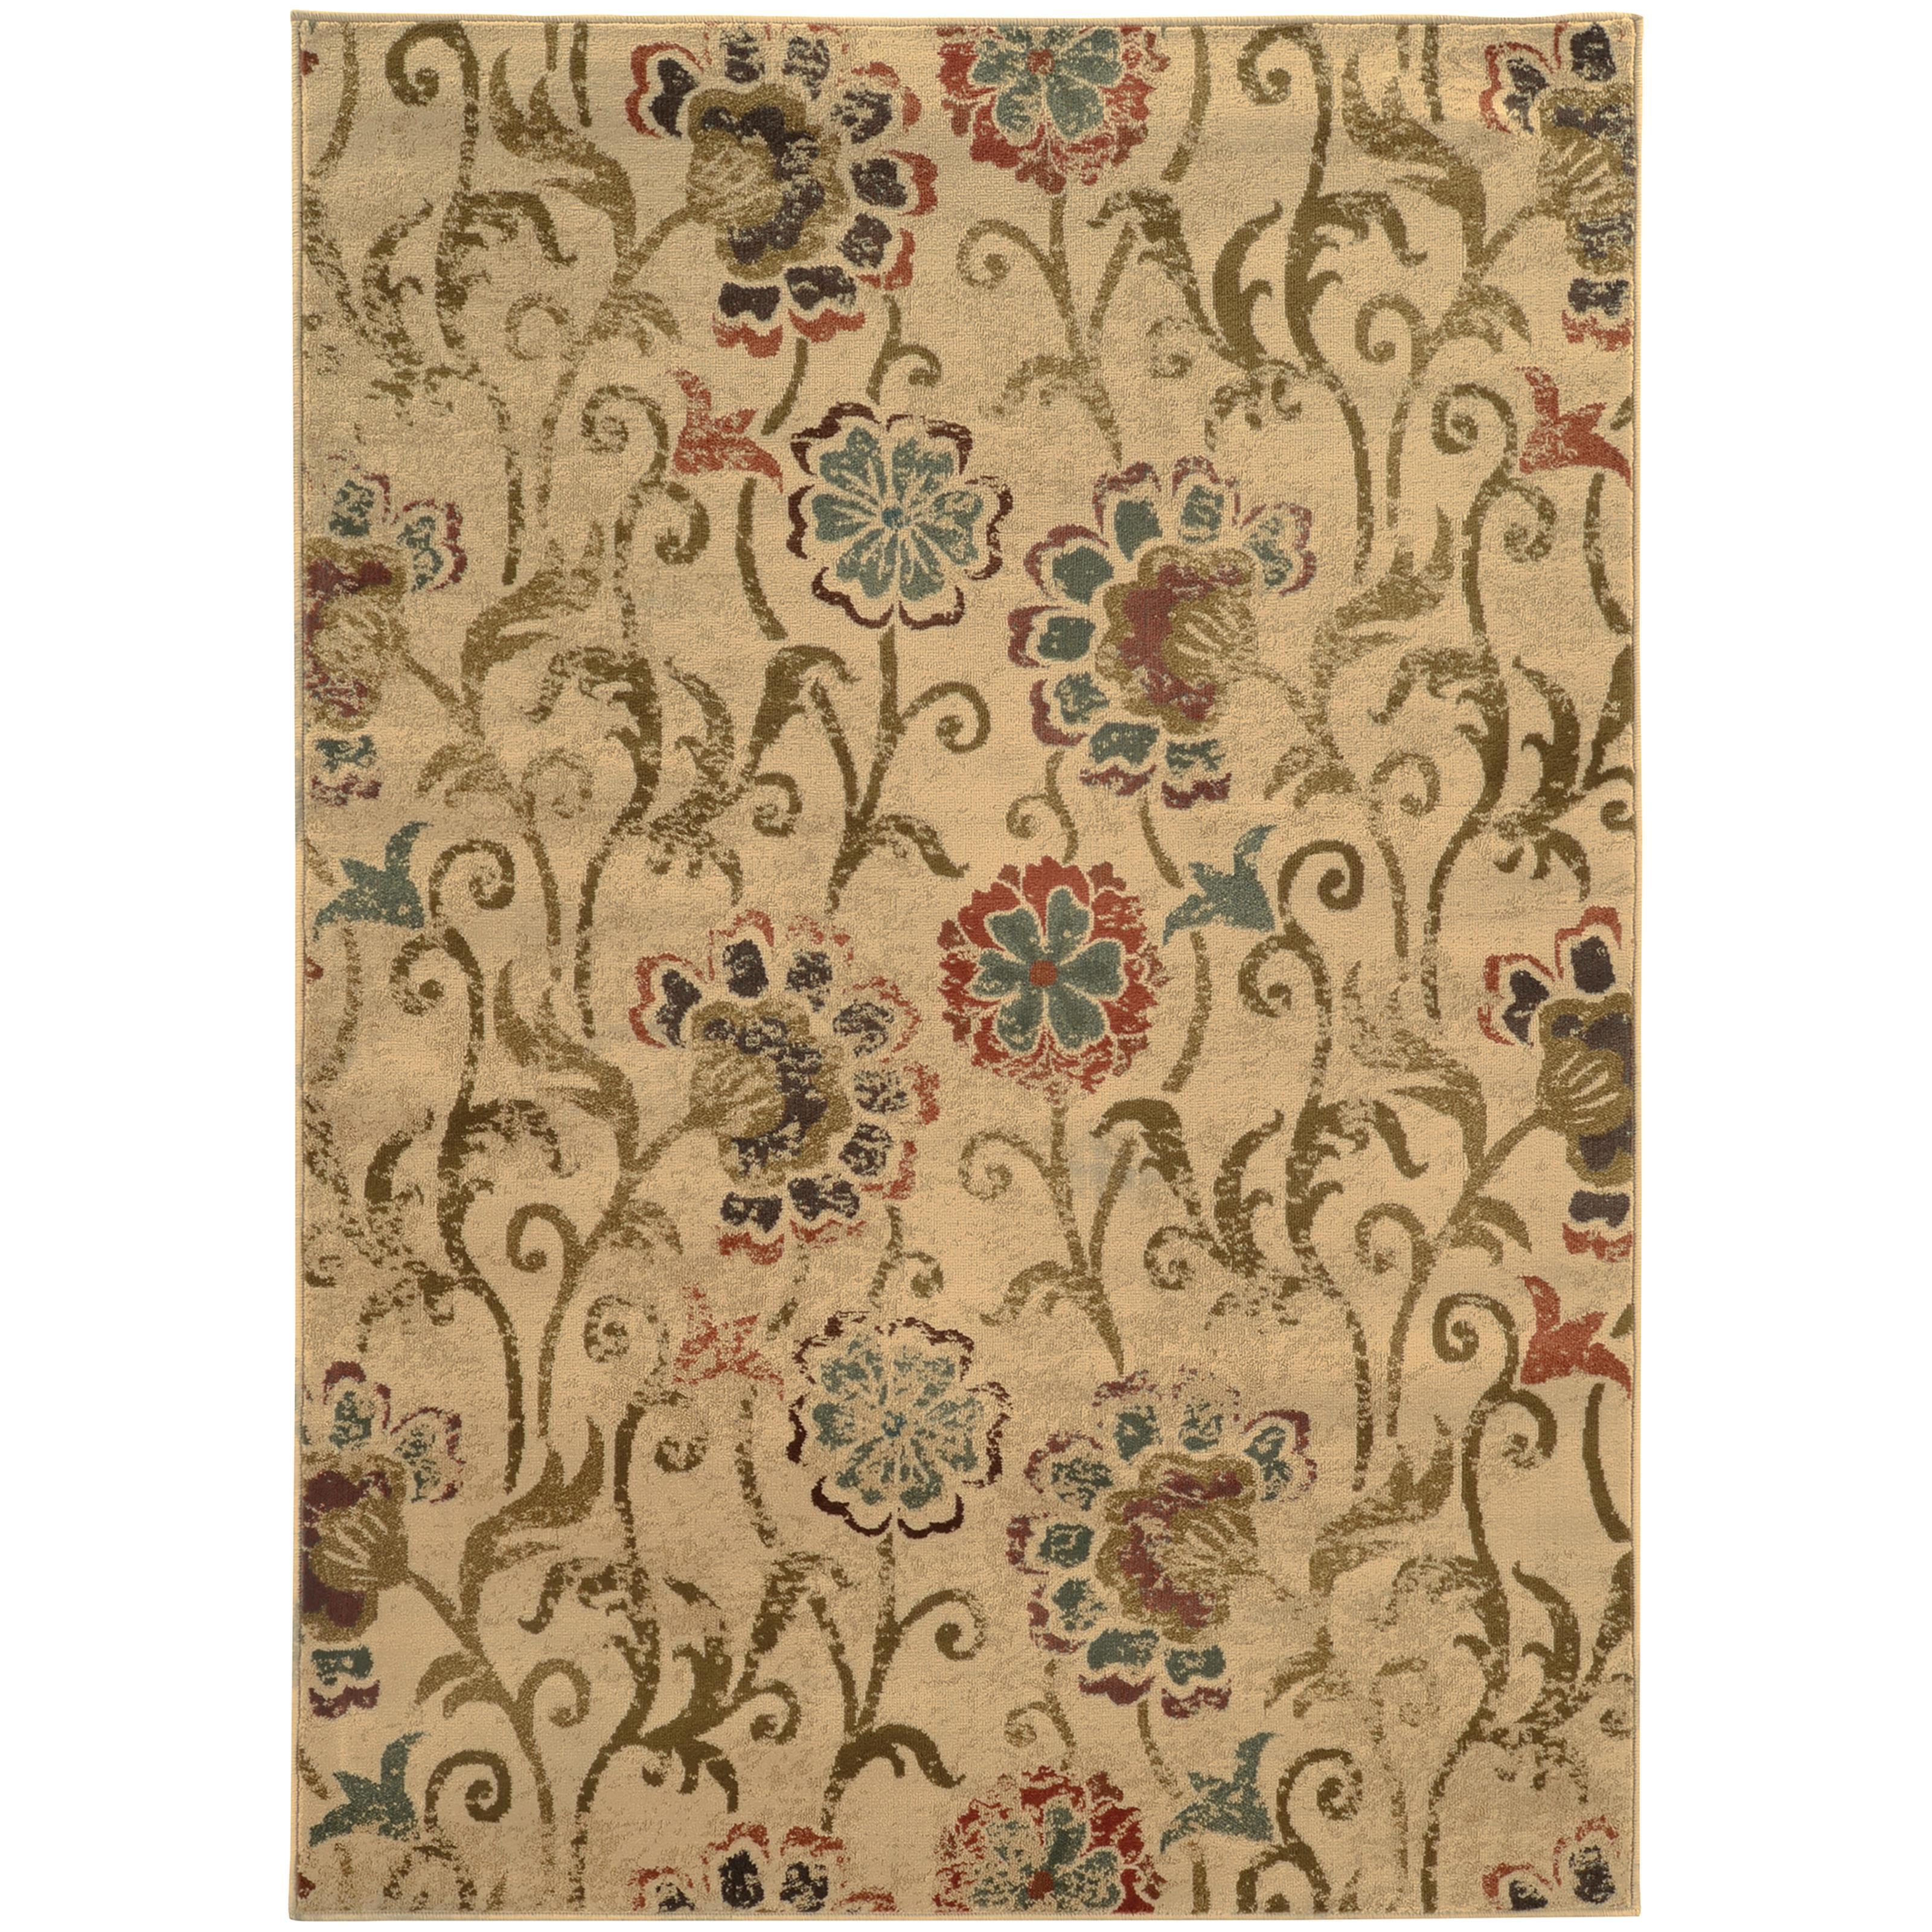 Oriental Weavers Hudson 10' X 13' Rug - Item Number: H4877B305396ST